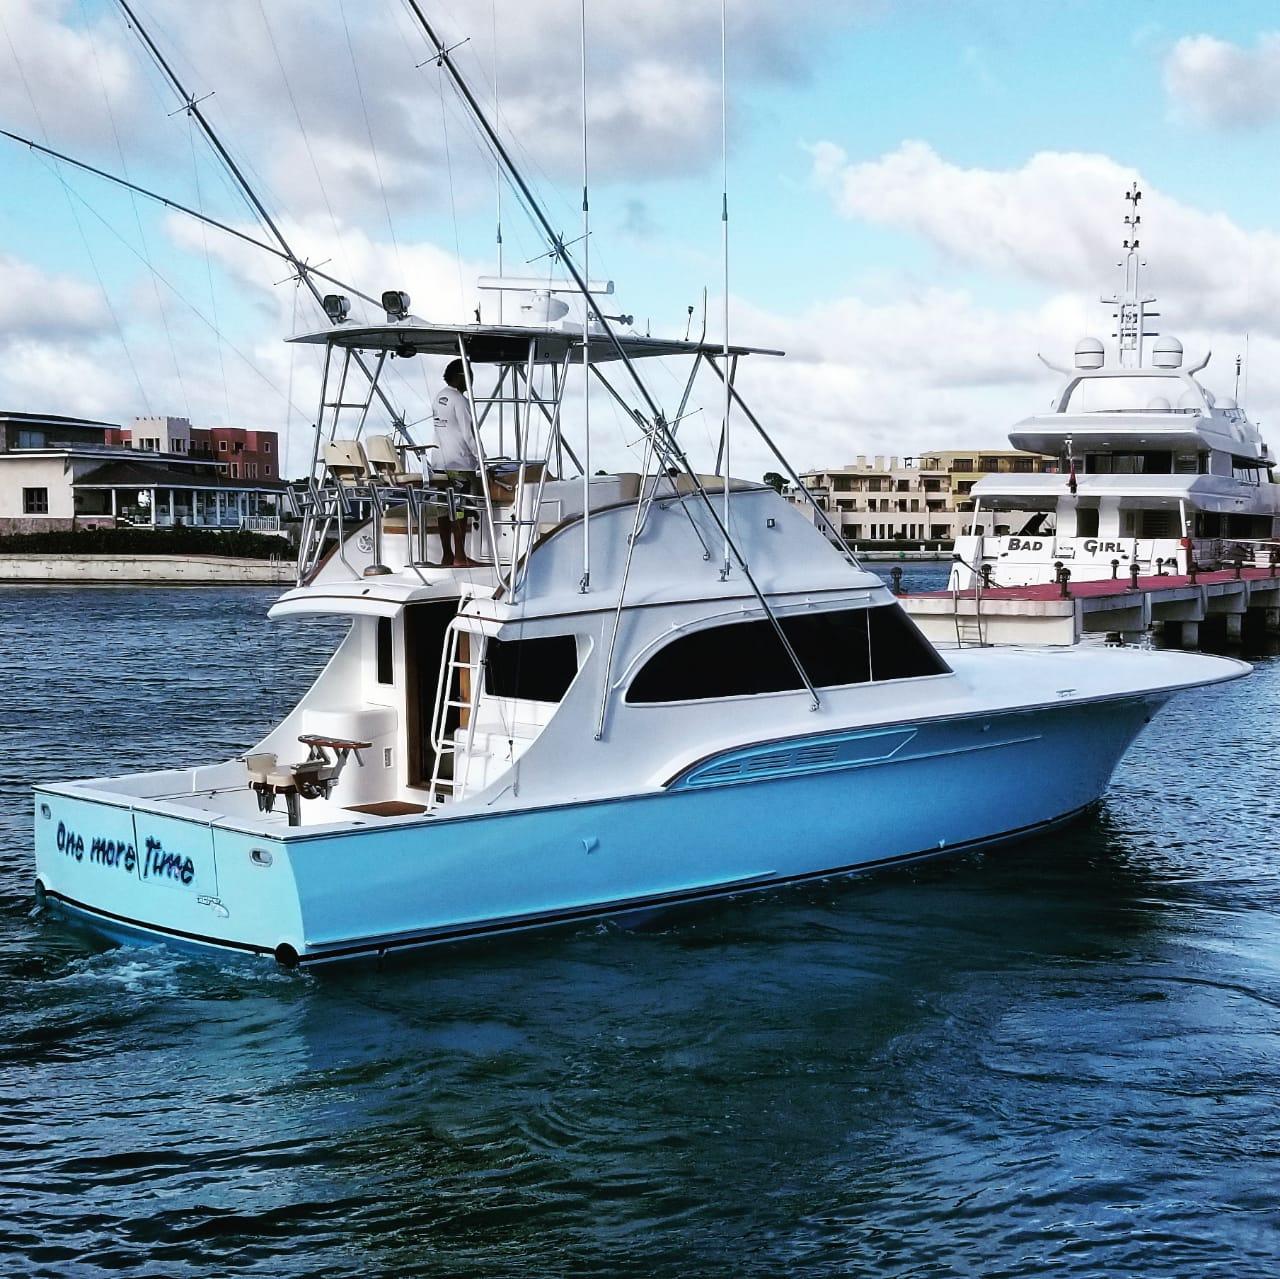 Private Fishing Trip Punta Cana